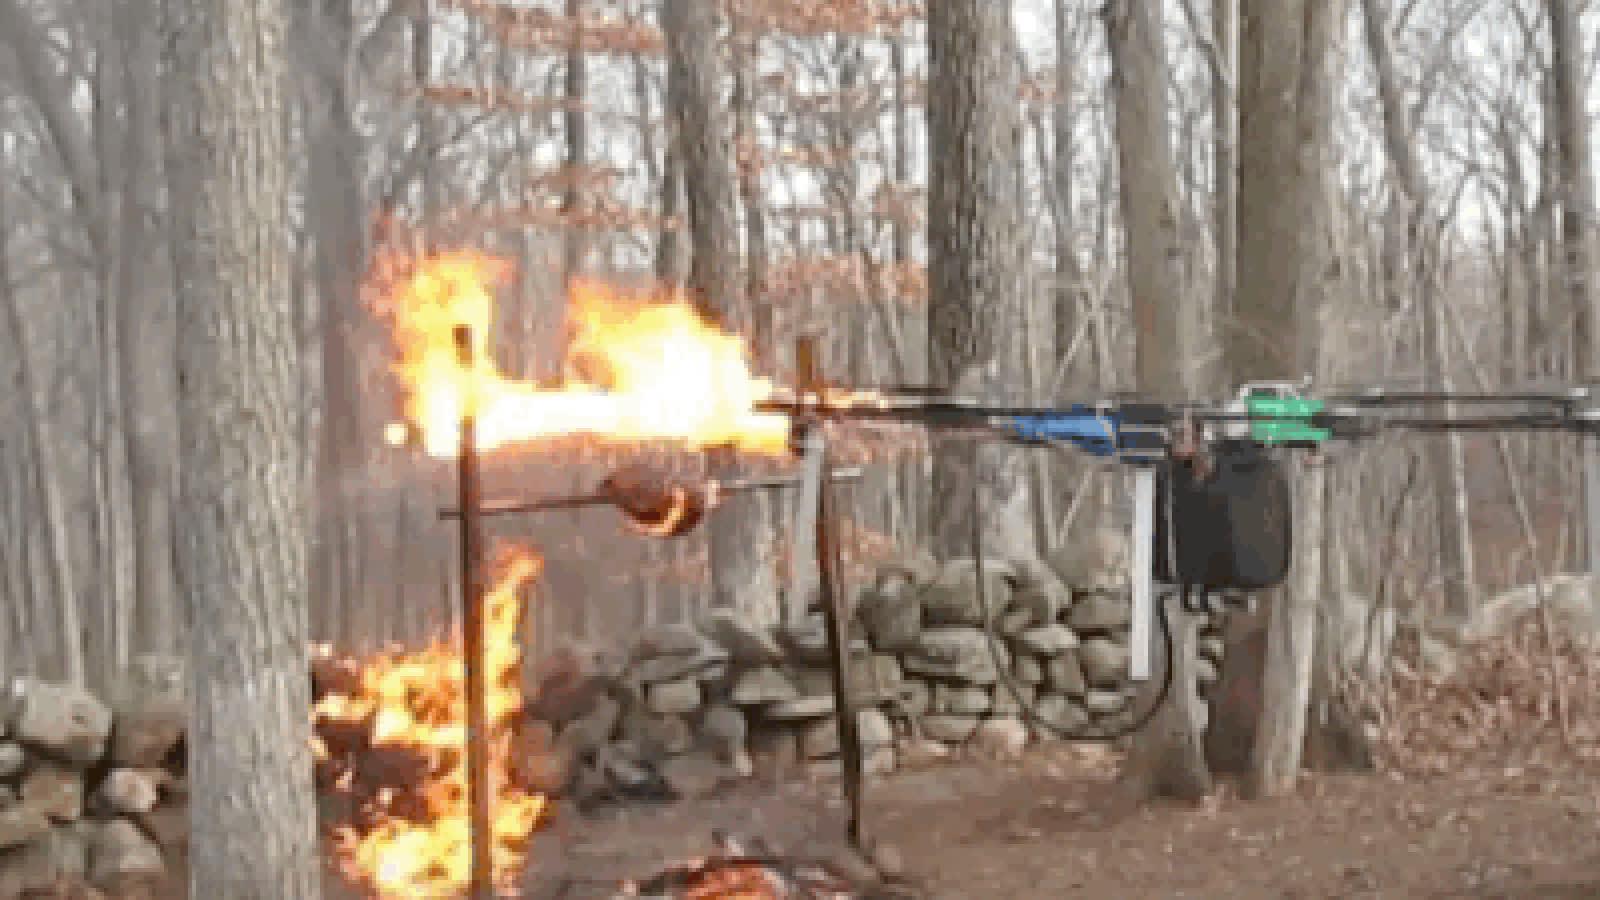 drone, drones, fire, flames, Drone GIFs